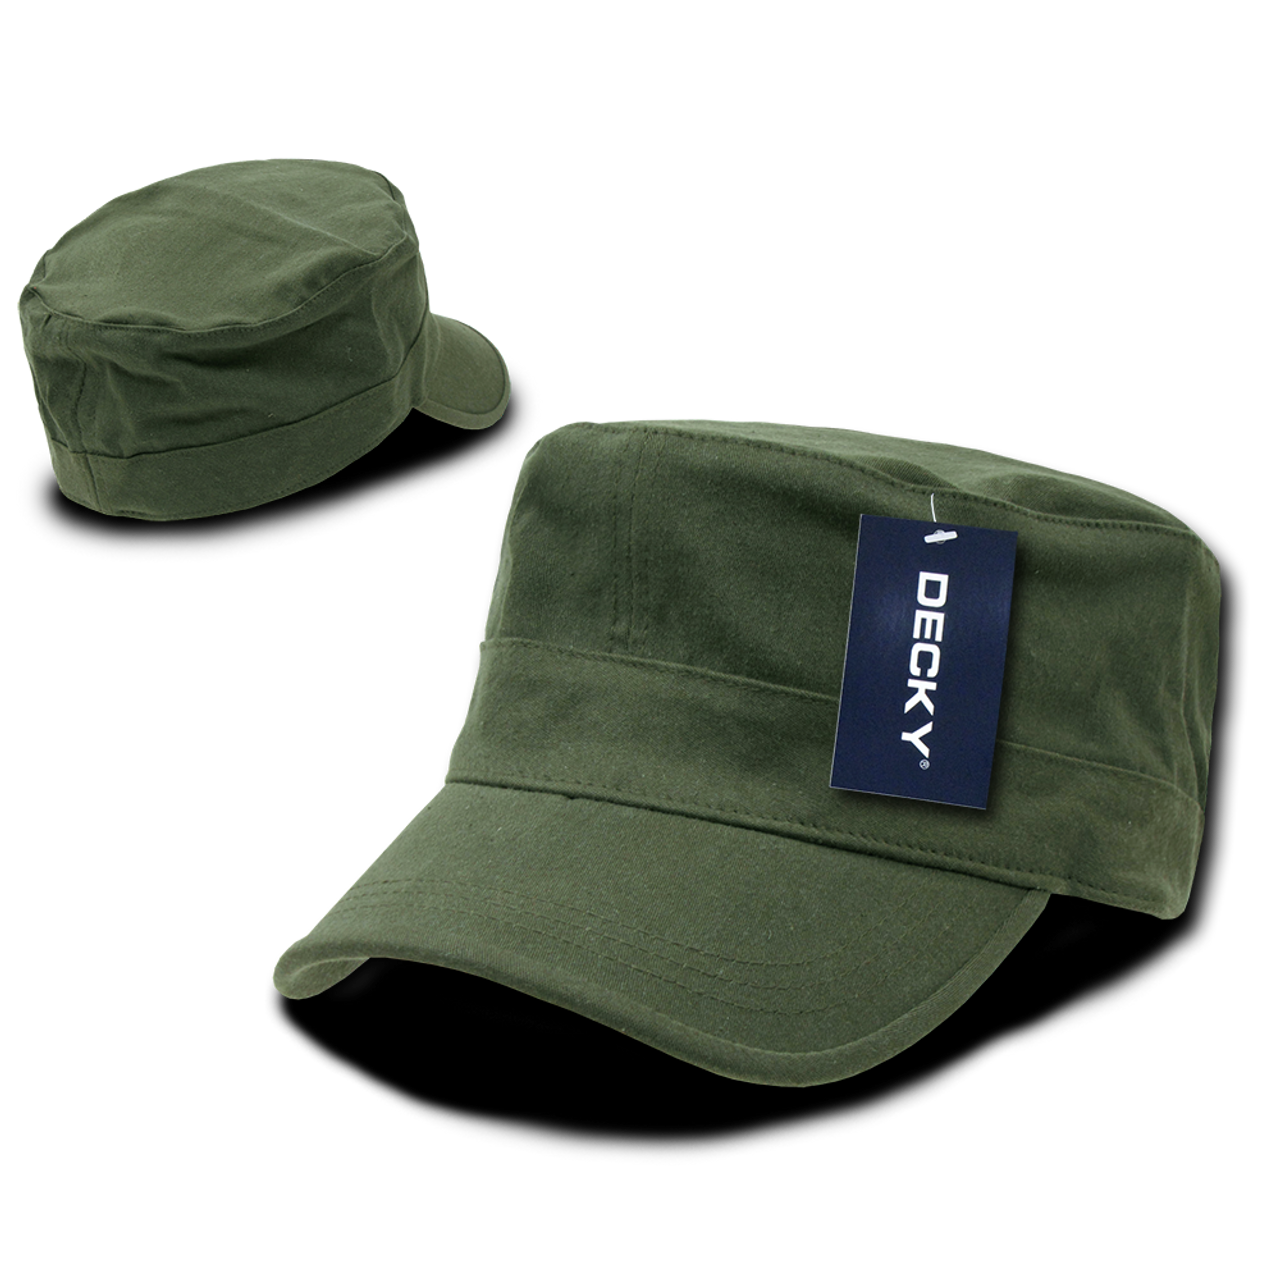 Flex Cadet Style Cap - Olive